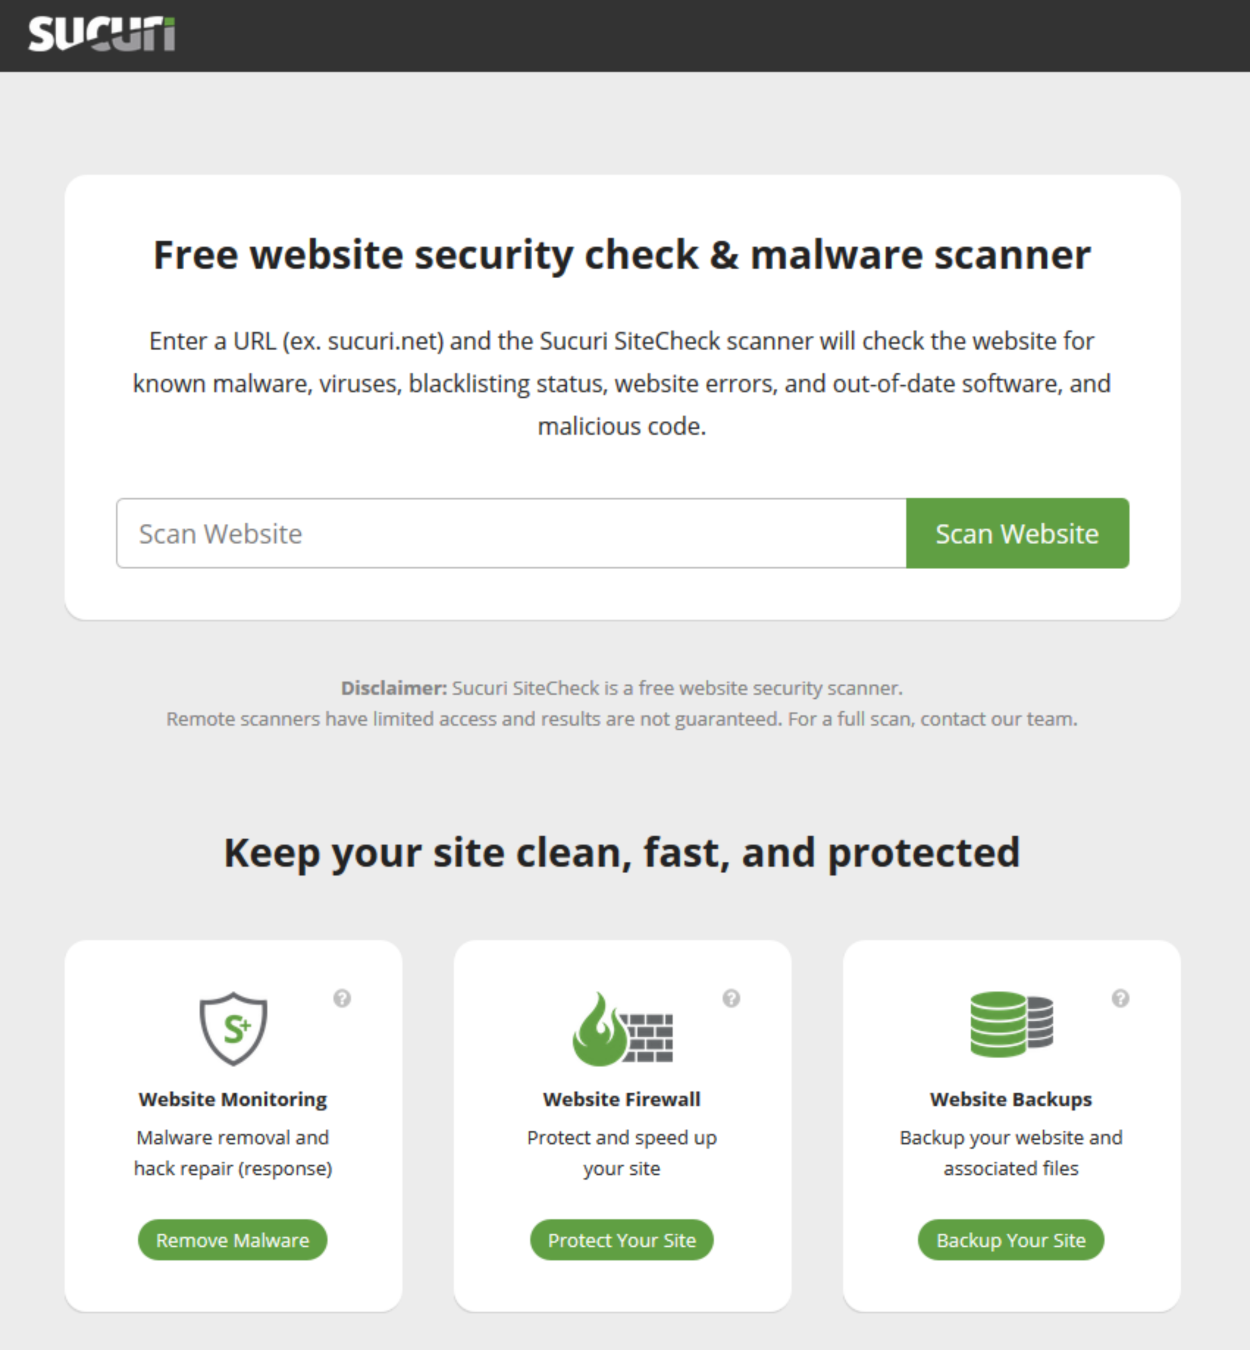 Sucuri SiteCheck Website Security - Homepage